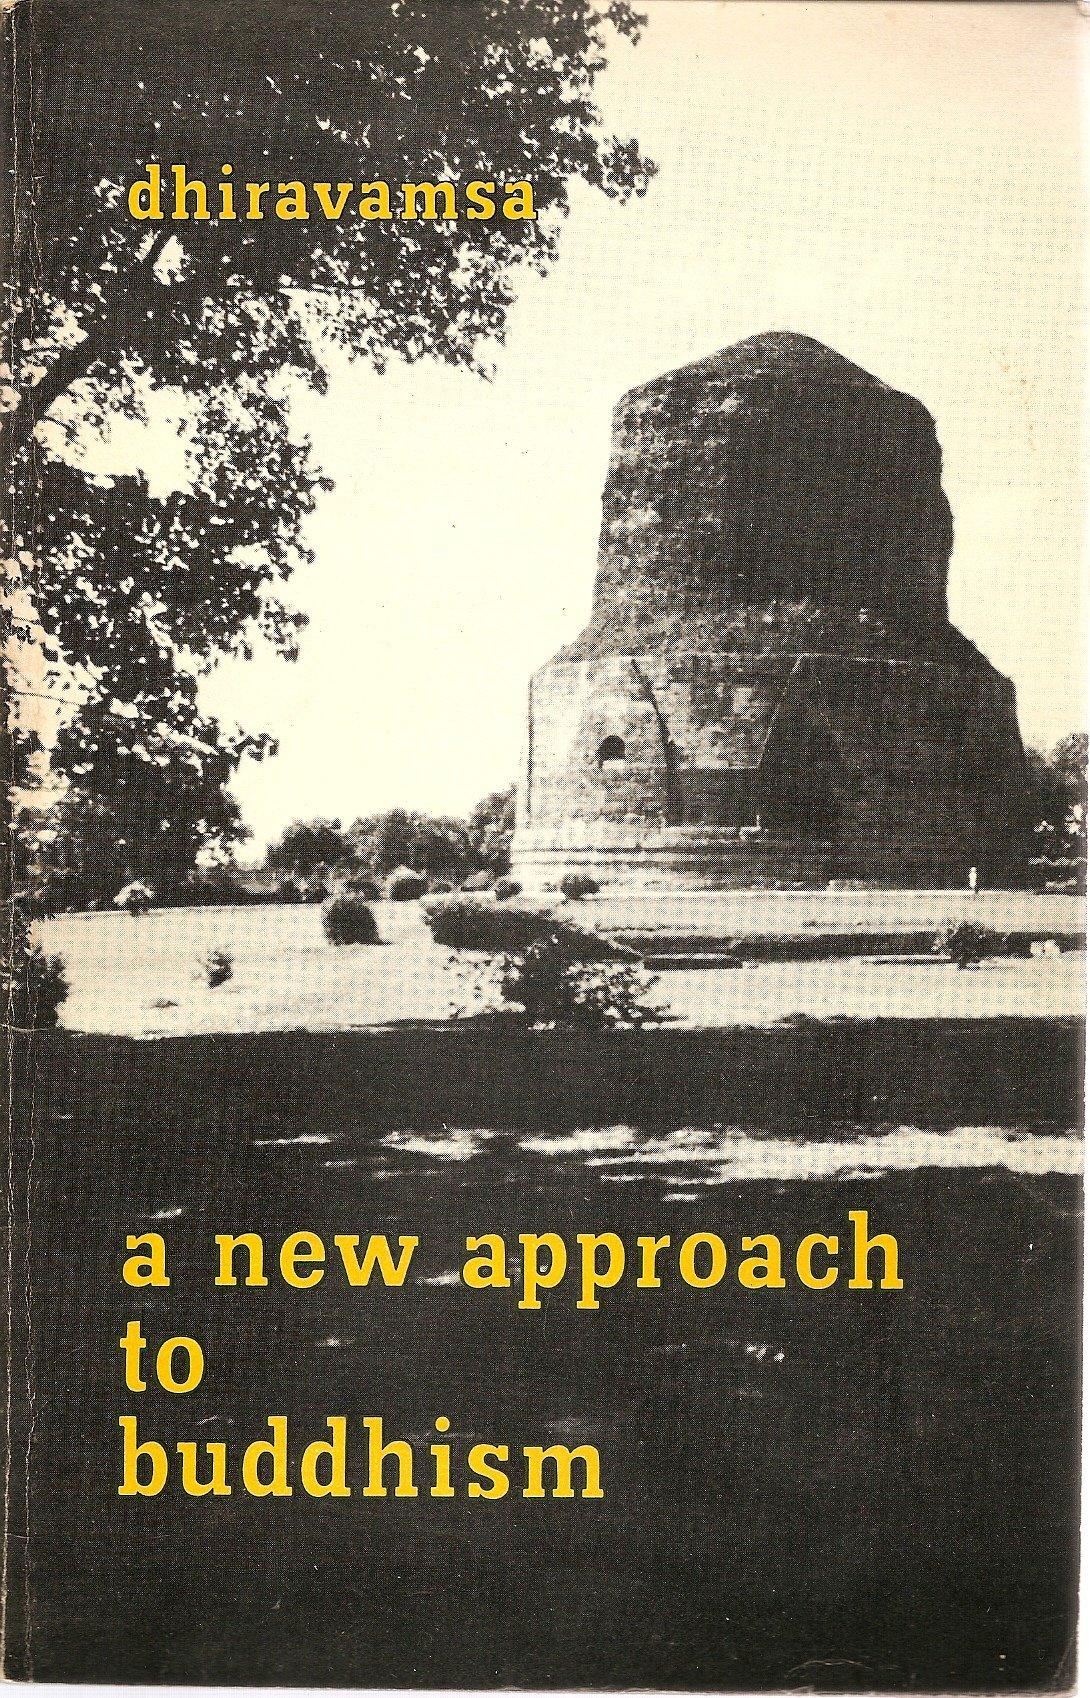 Dhiravamsa New Approach cover art